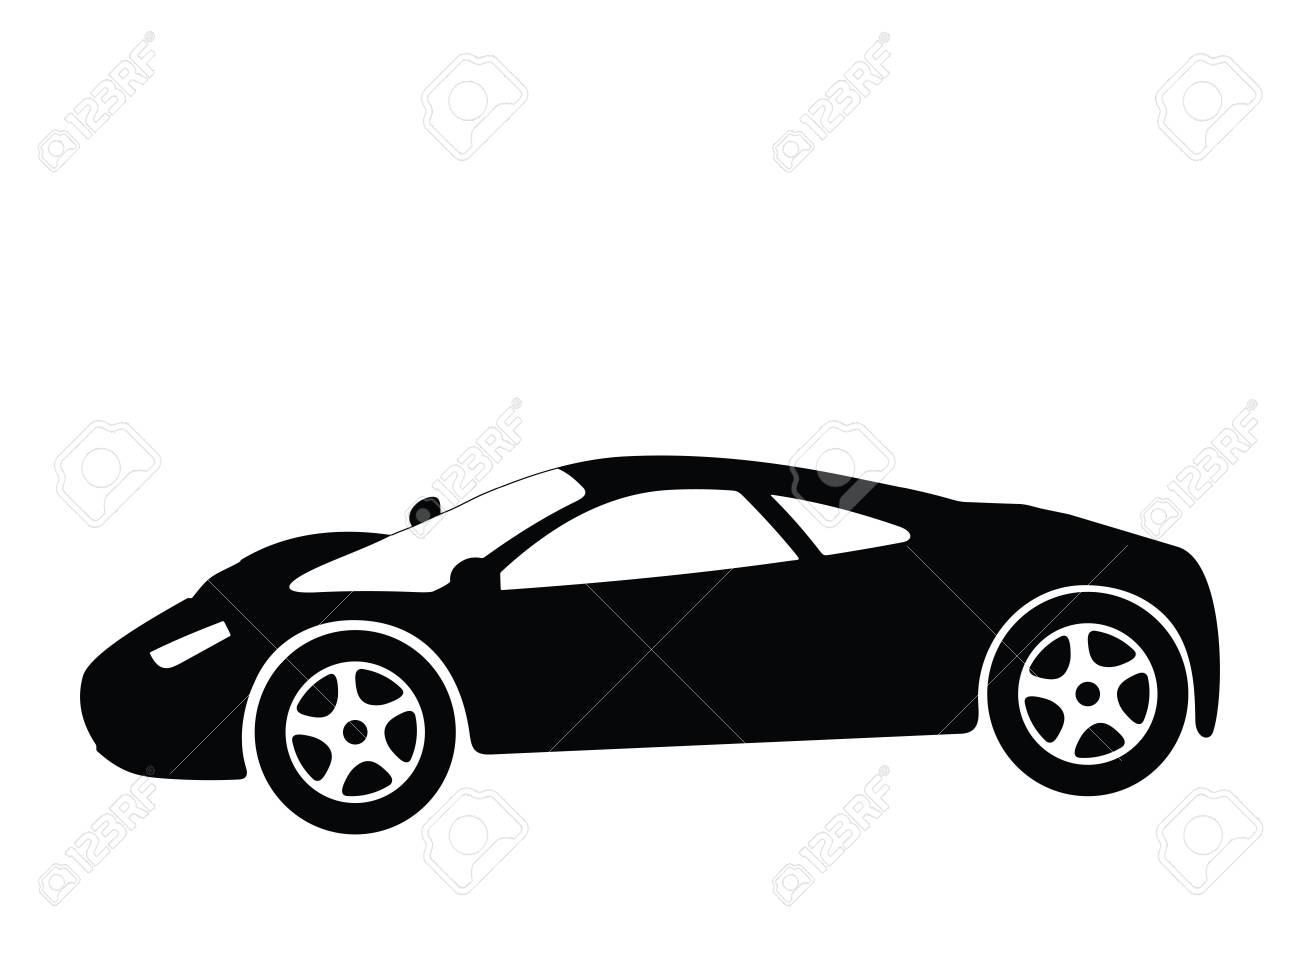 Silhouette a sport car, illustration Stock Illustration - 2563256